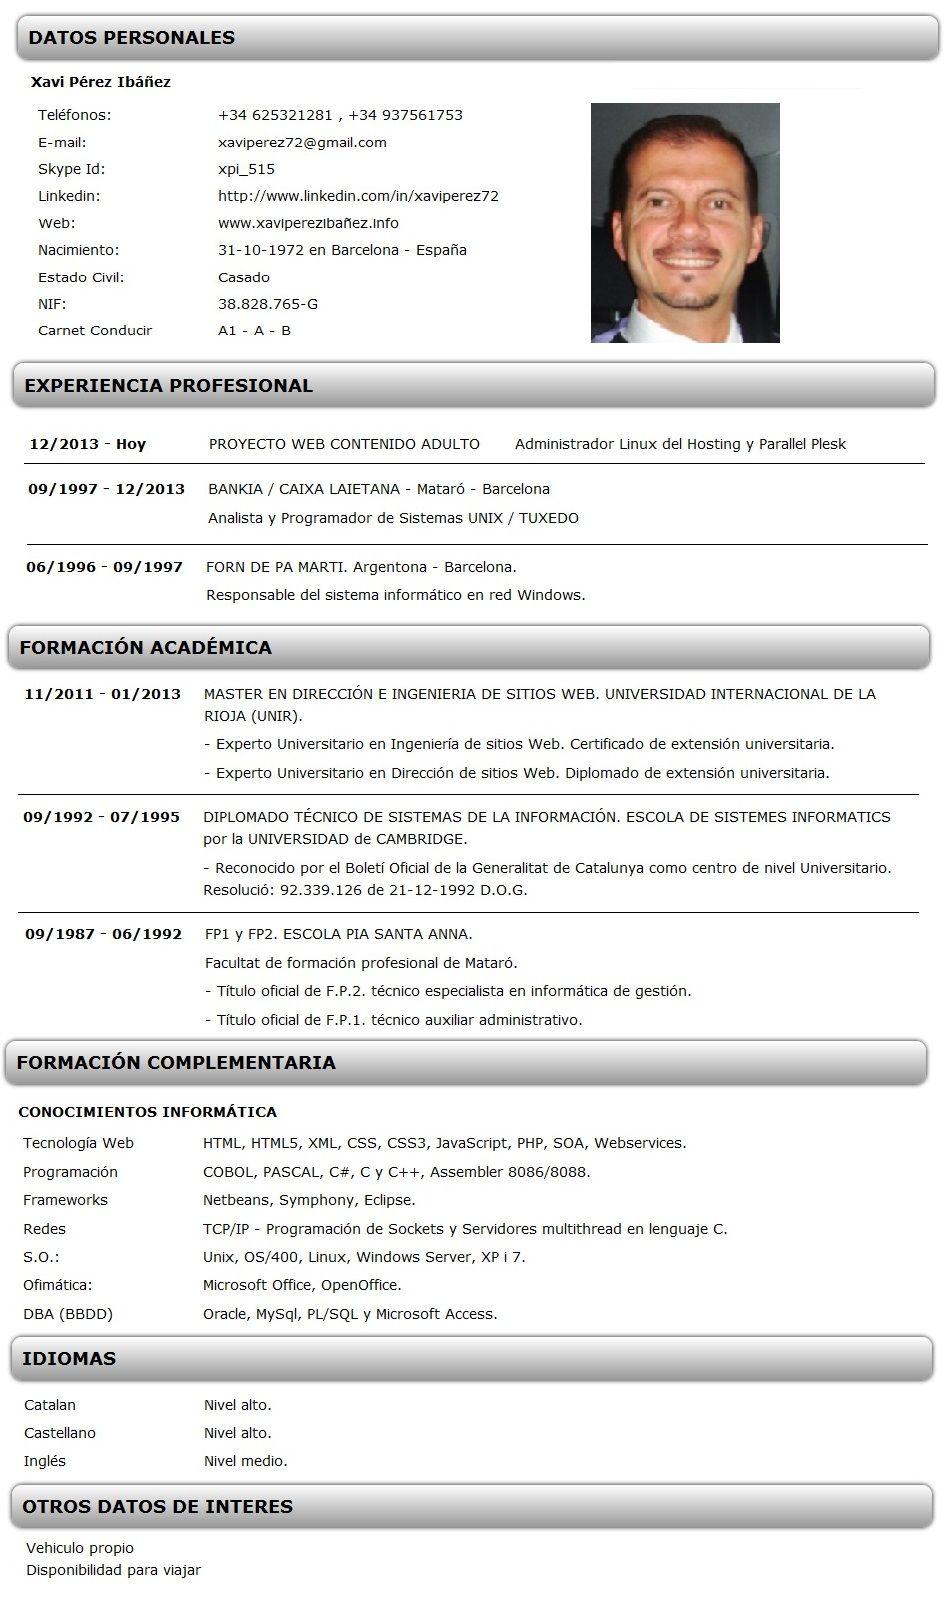 Ejemplo Curriculum Vitae Informatico Jpg 950 1598 E4 Pinterest